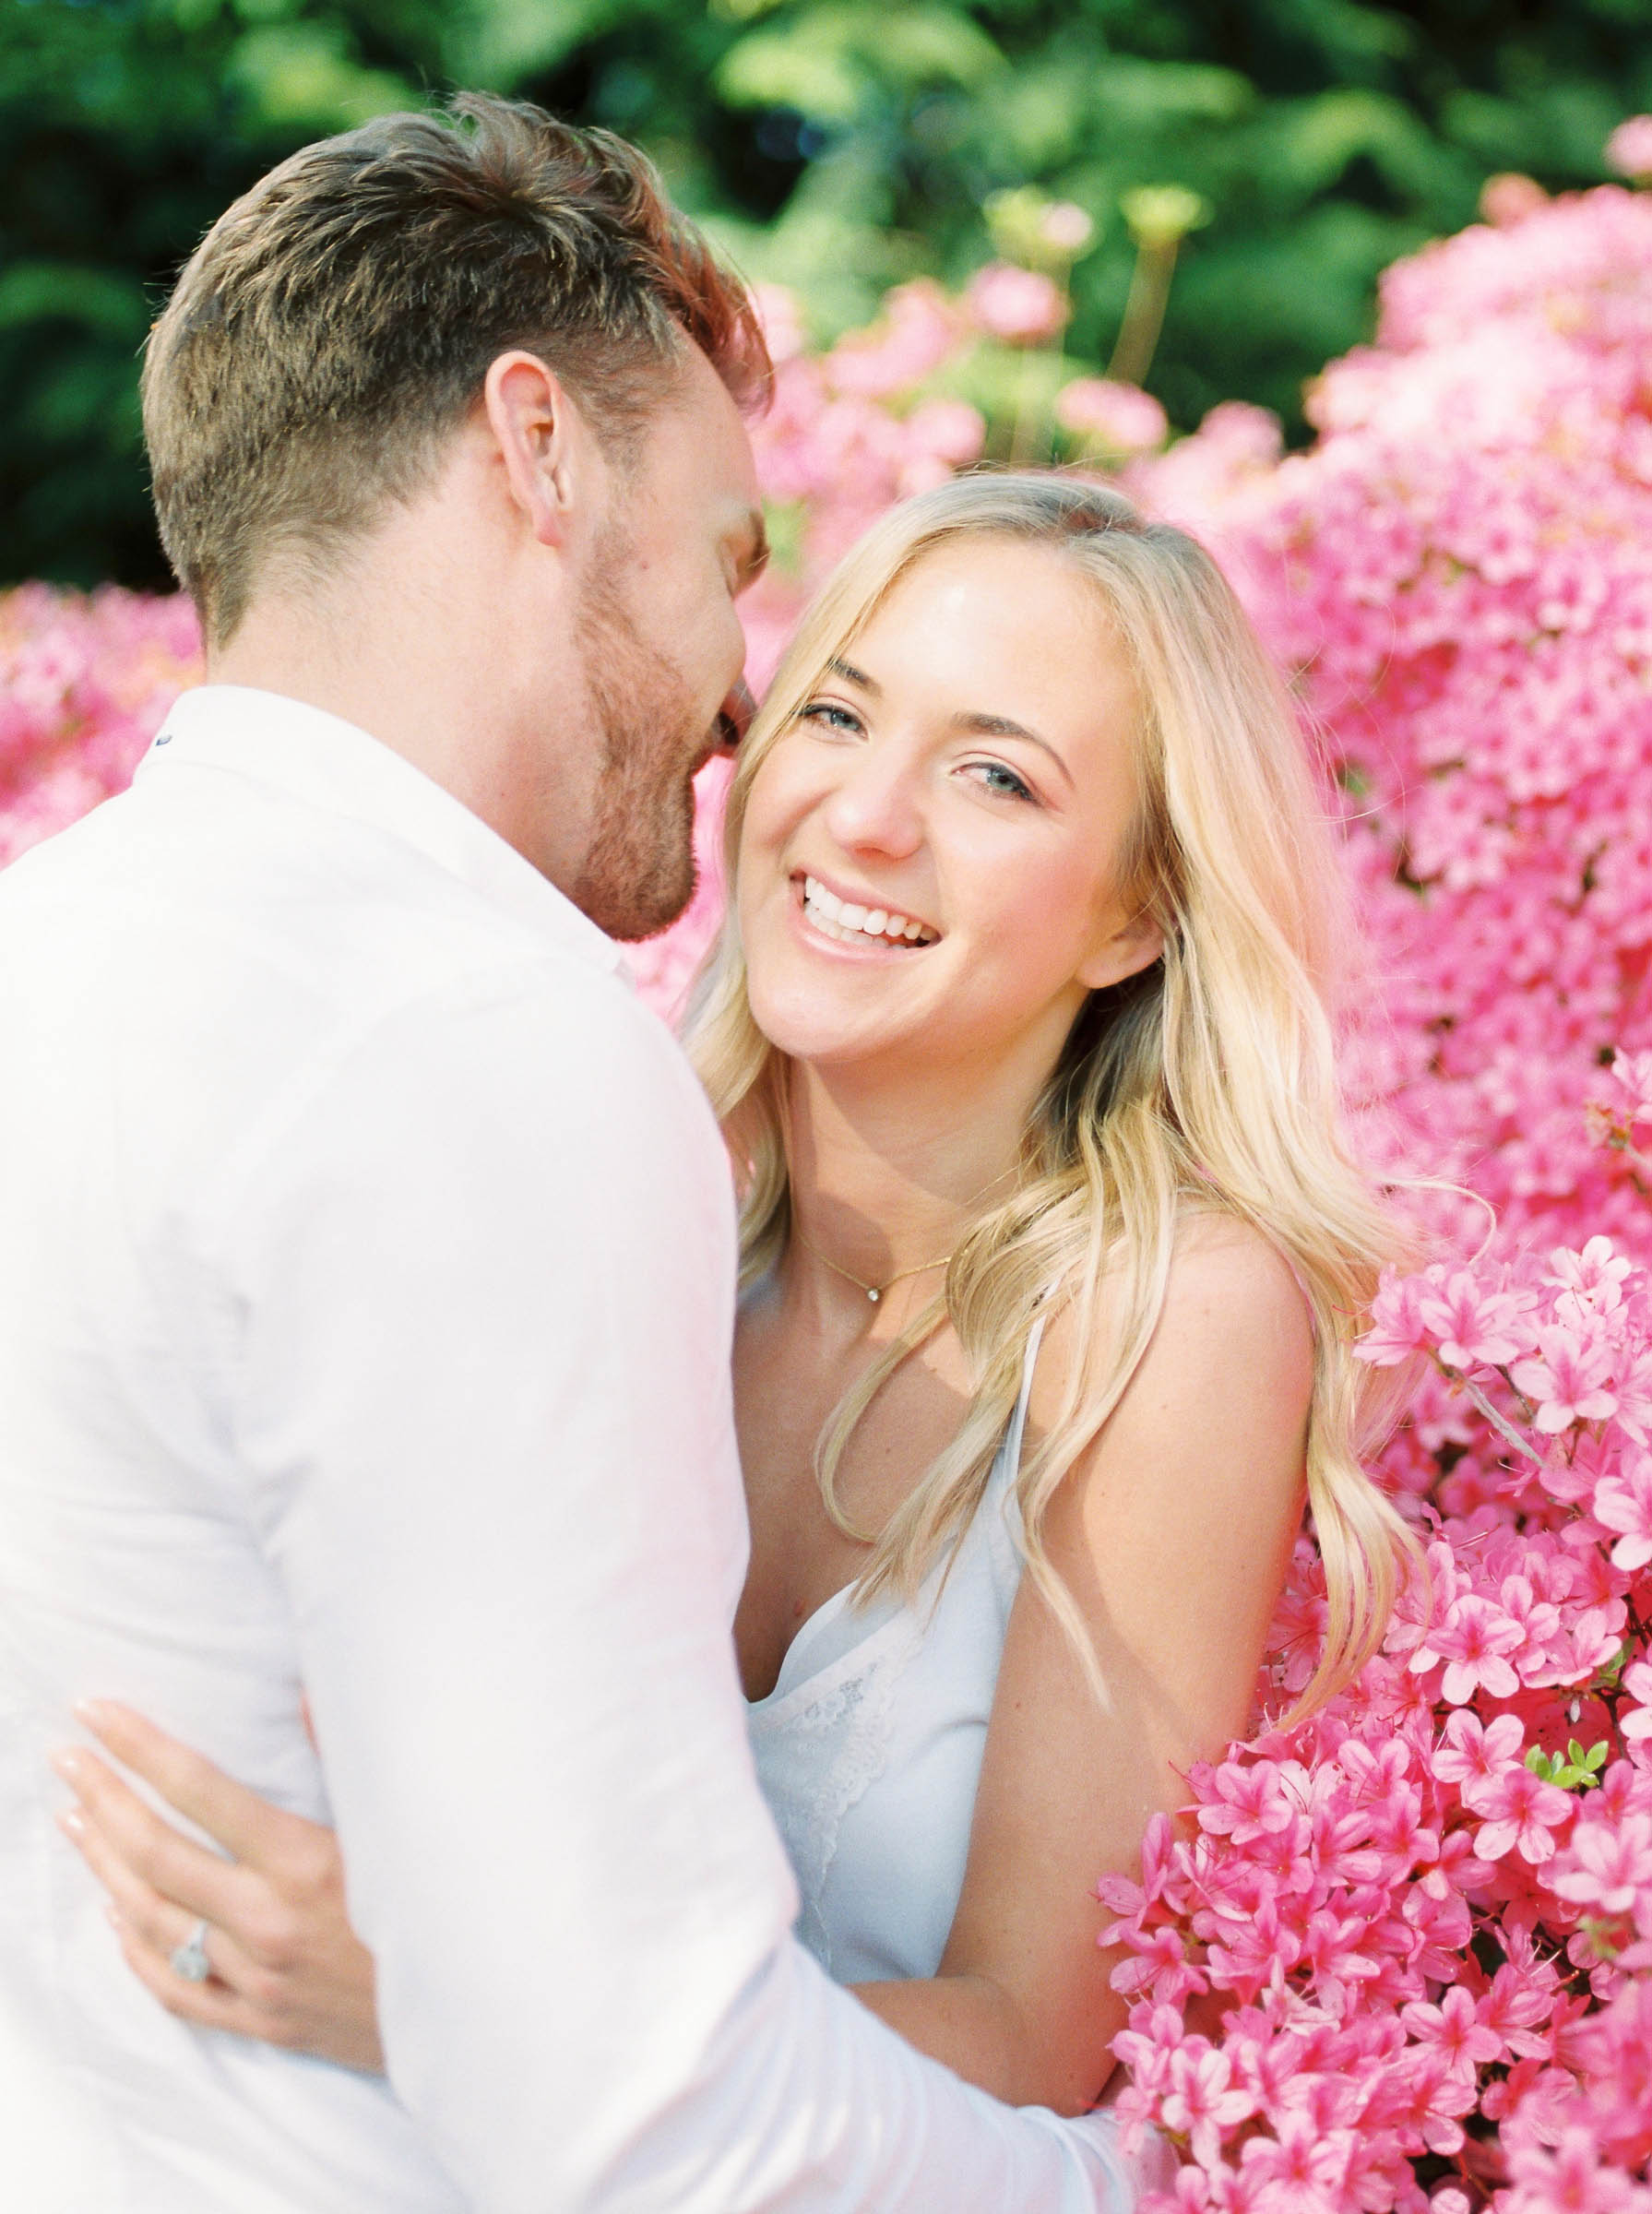 Amy O'Boyle Photography- Destination & UK Fine Art Film Wedding Photographer- Sheffield Park Garden National Trust Spring Engagement Shoot-21.jpg